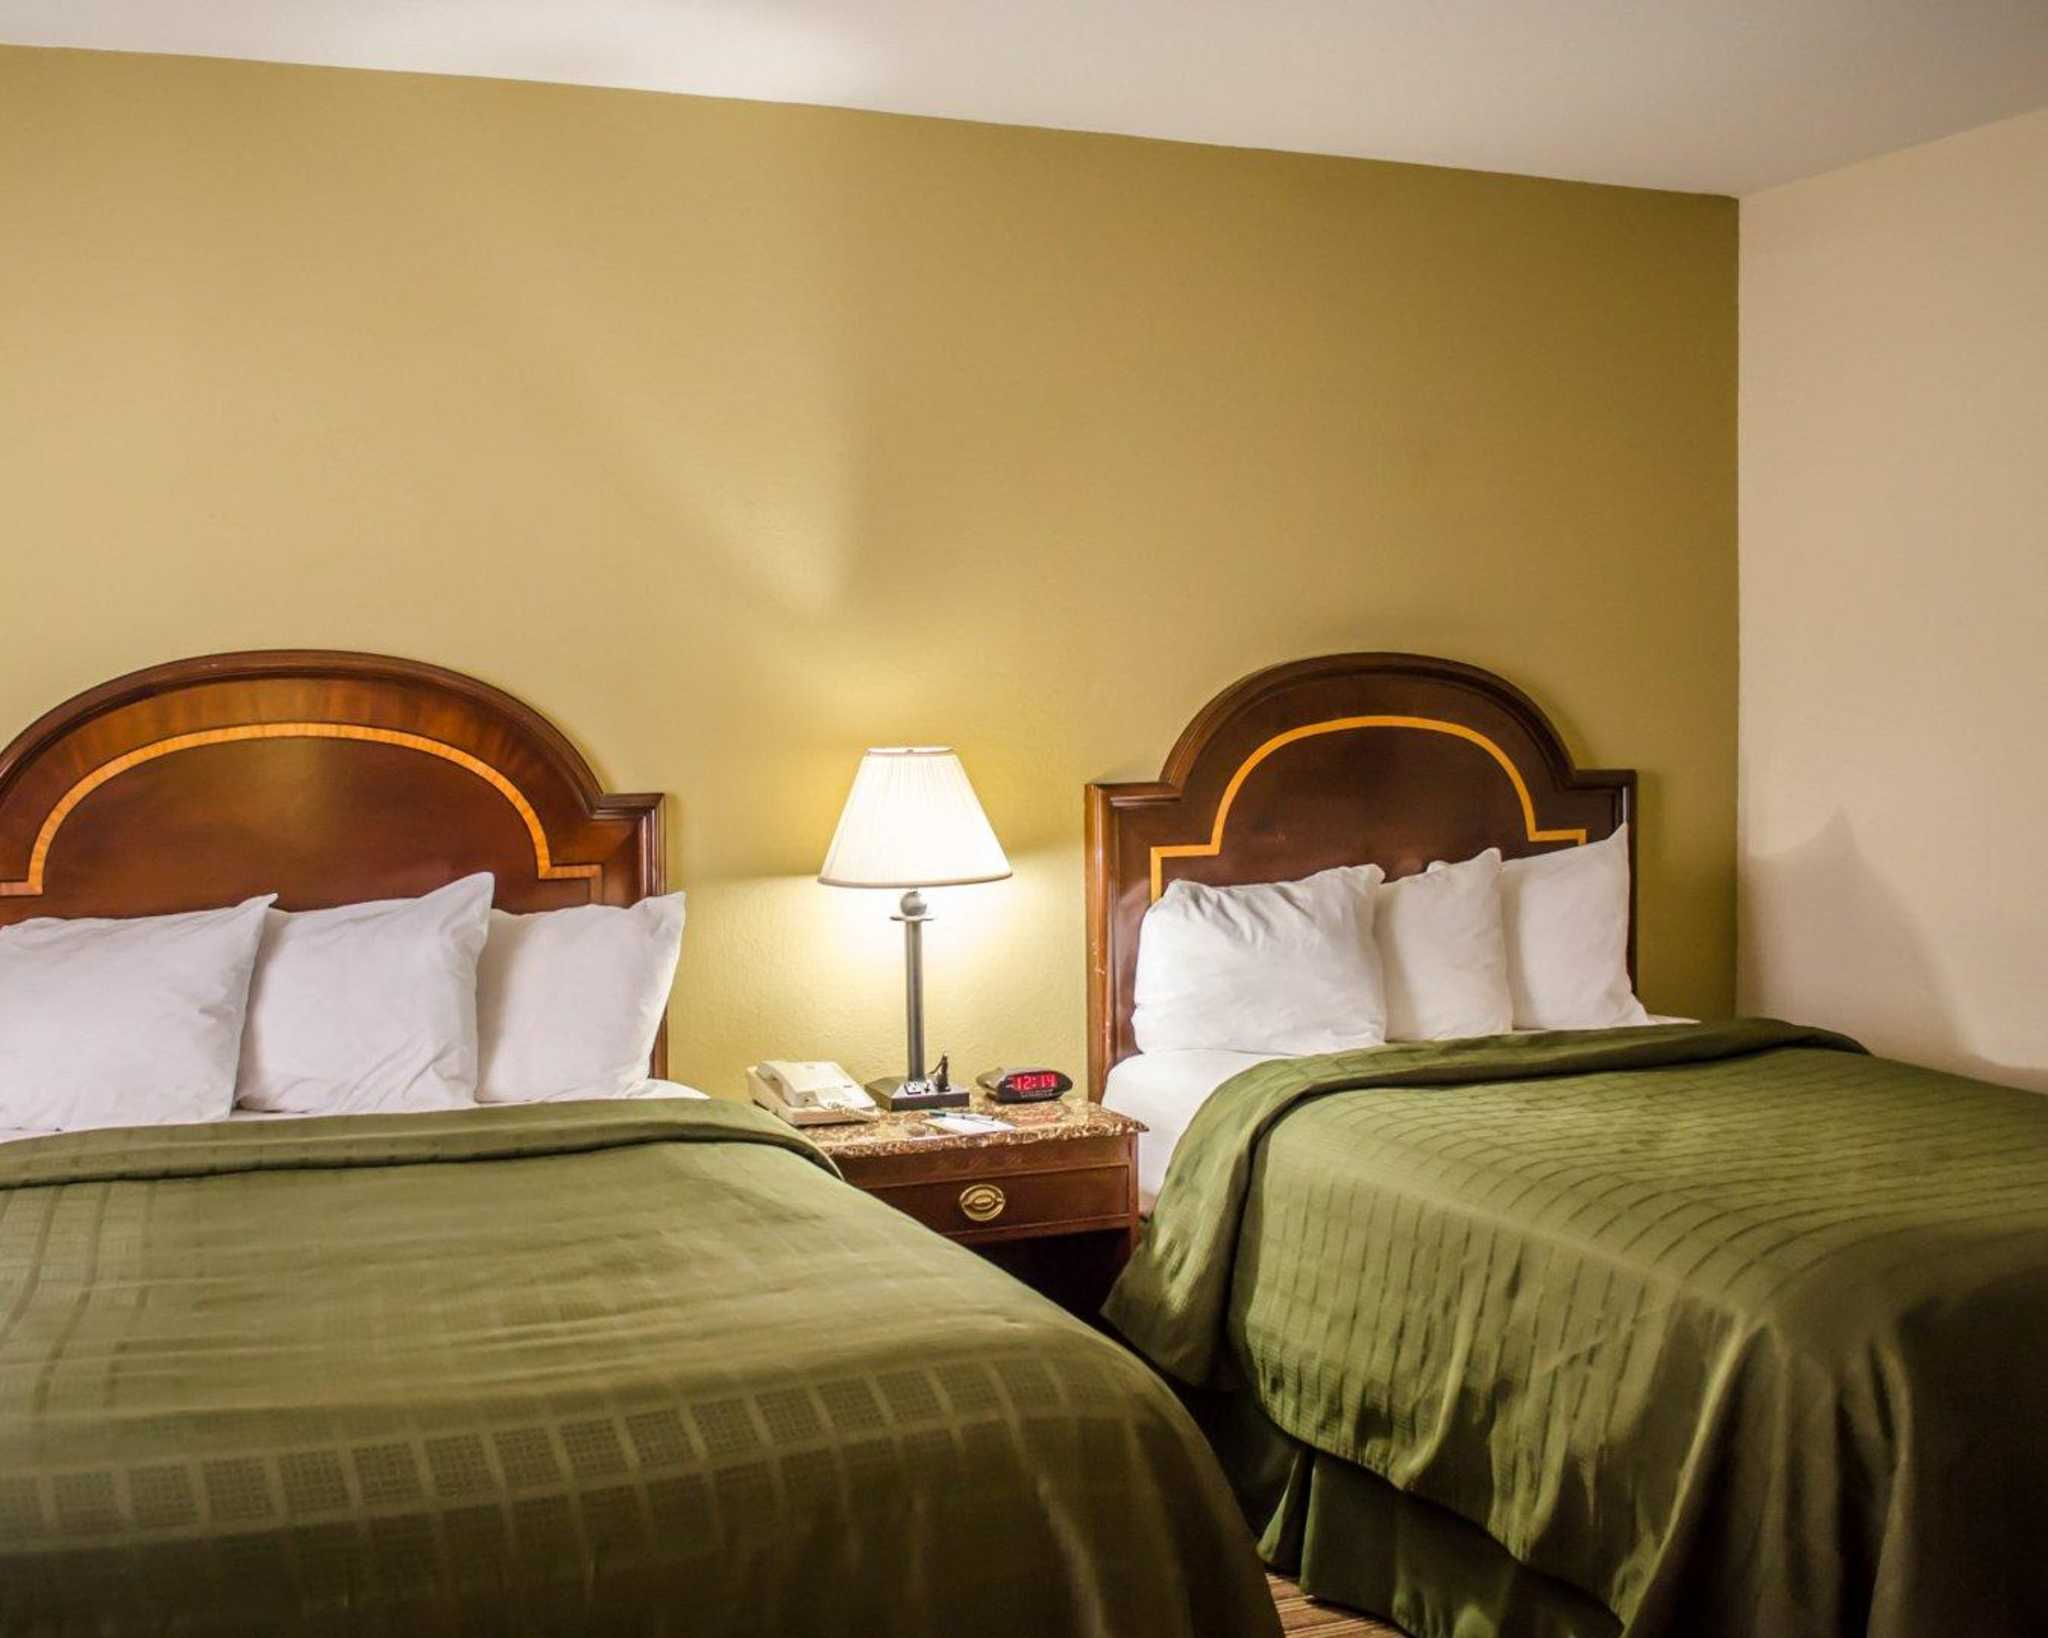 Quality Inn & Suites Pensacola Bayview in Pensacola, FL, photo #16